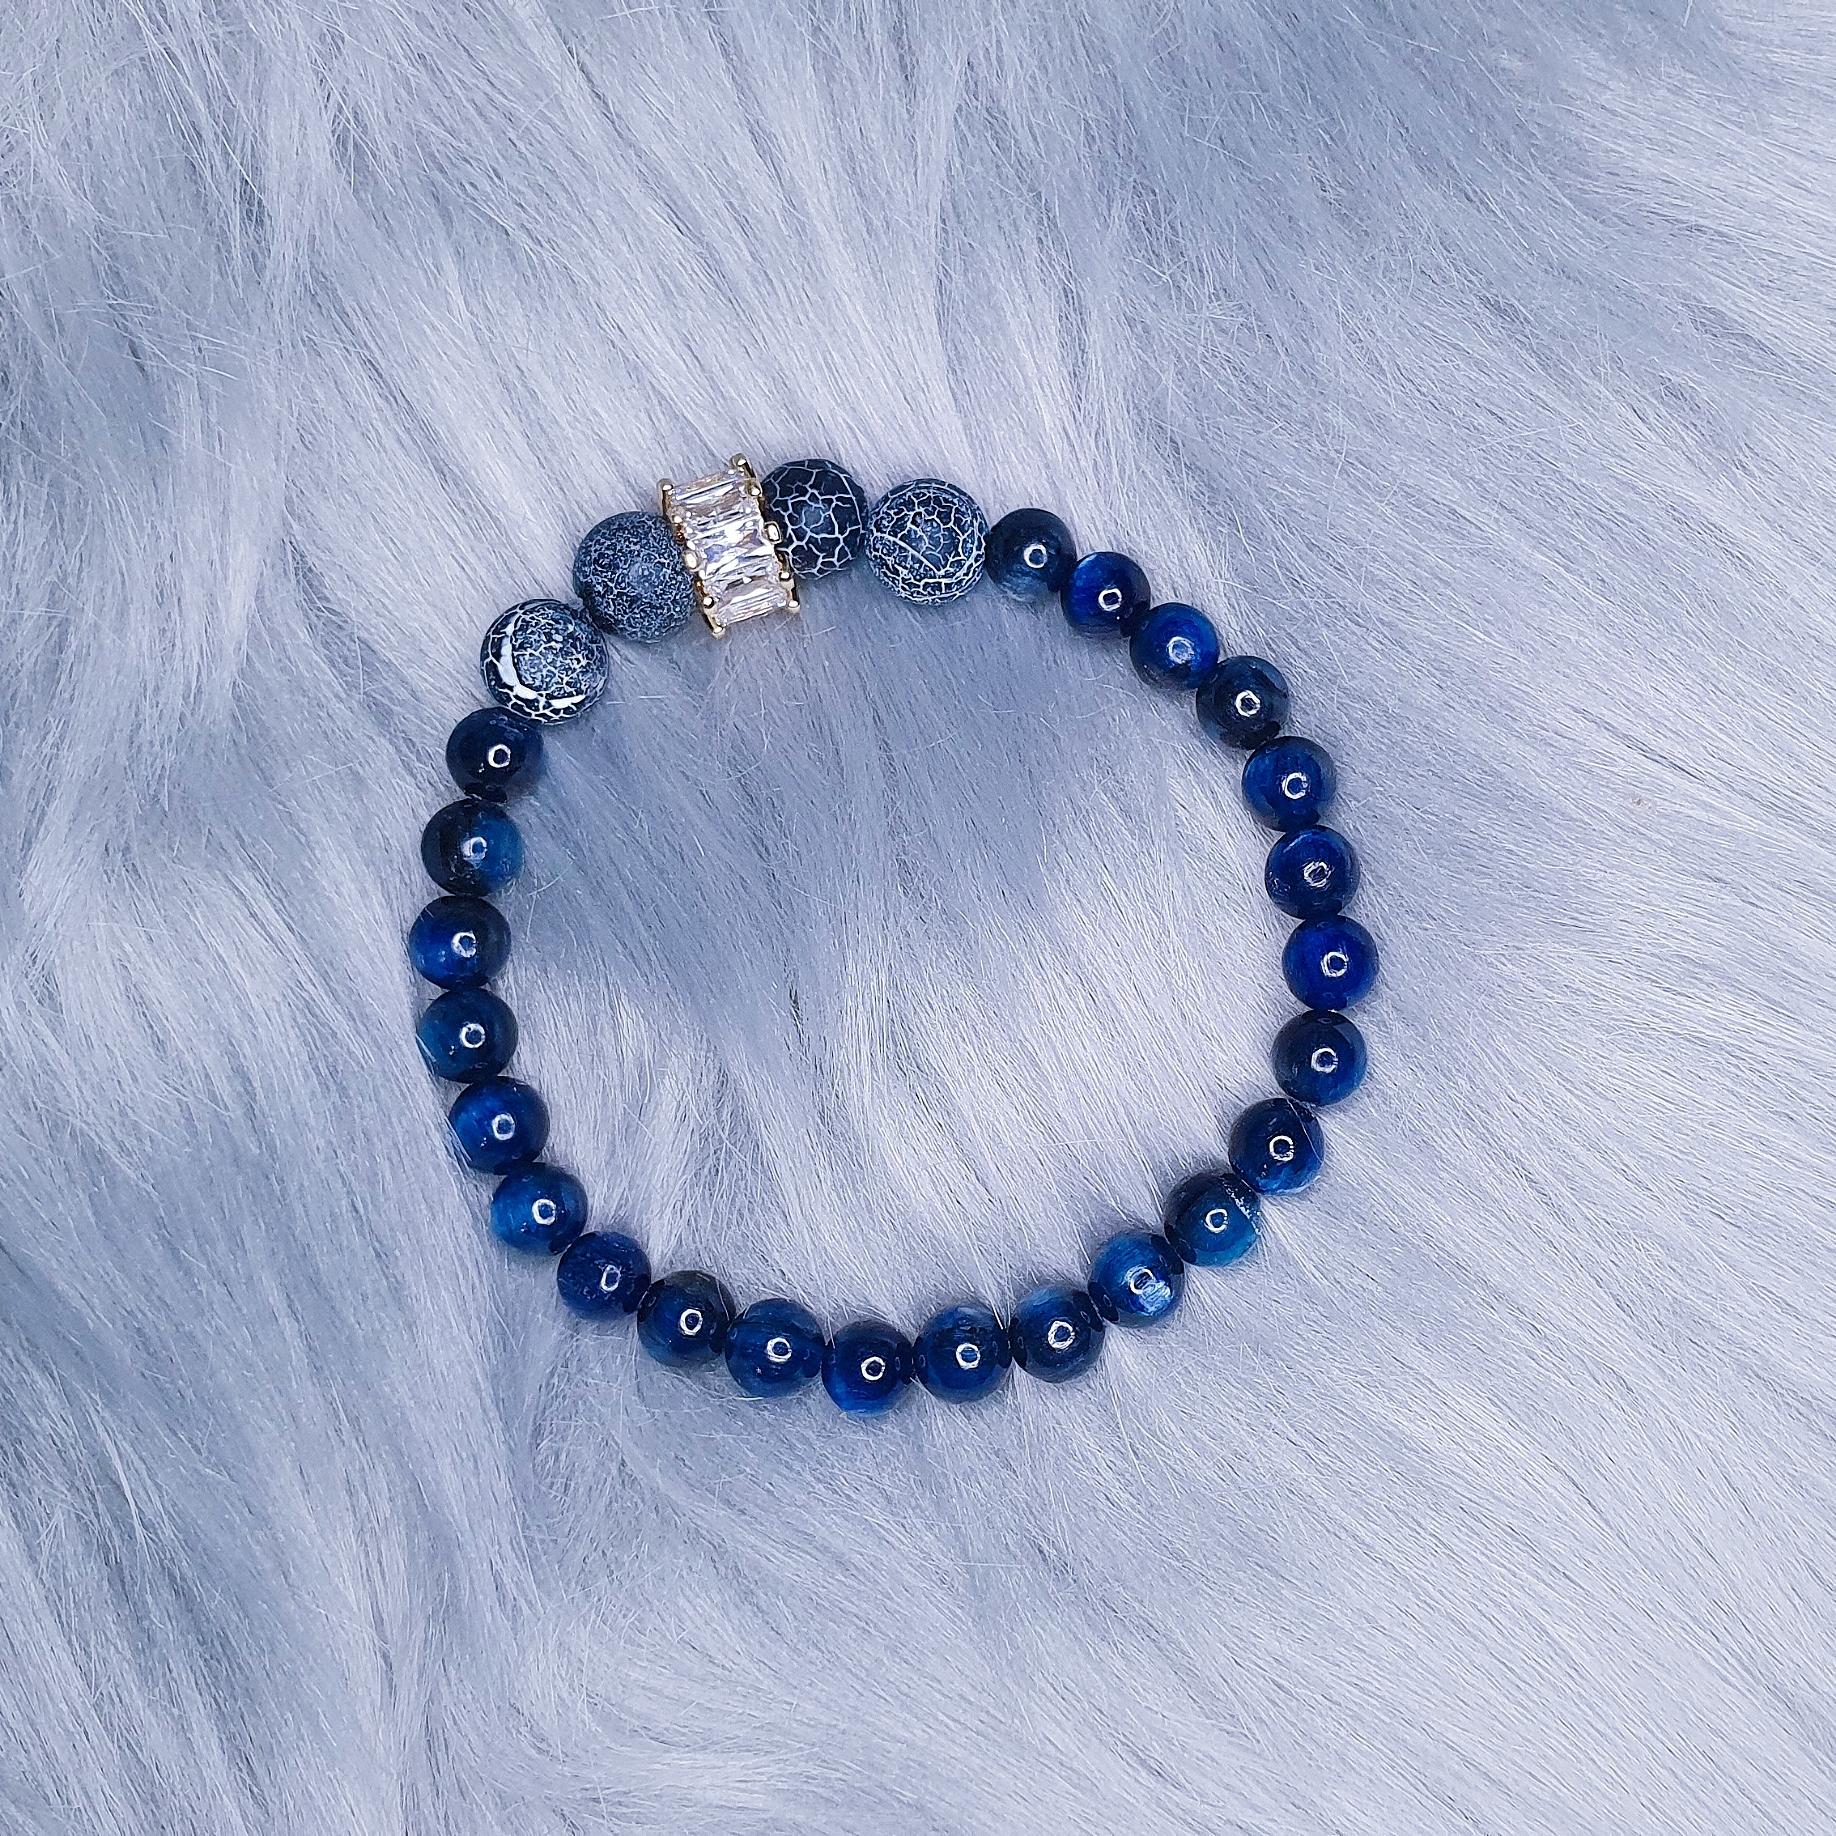 midnight-princess-kyanite-bracelet-square